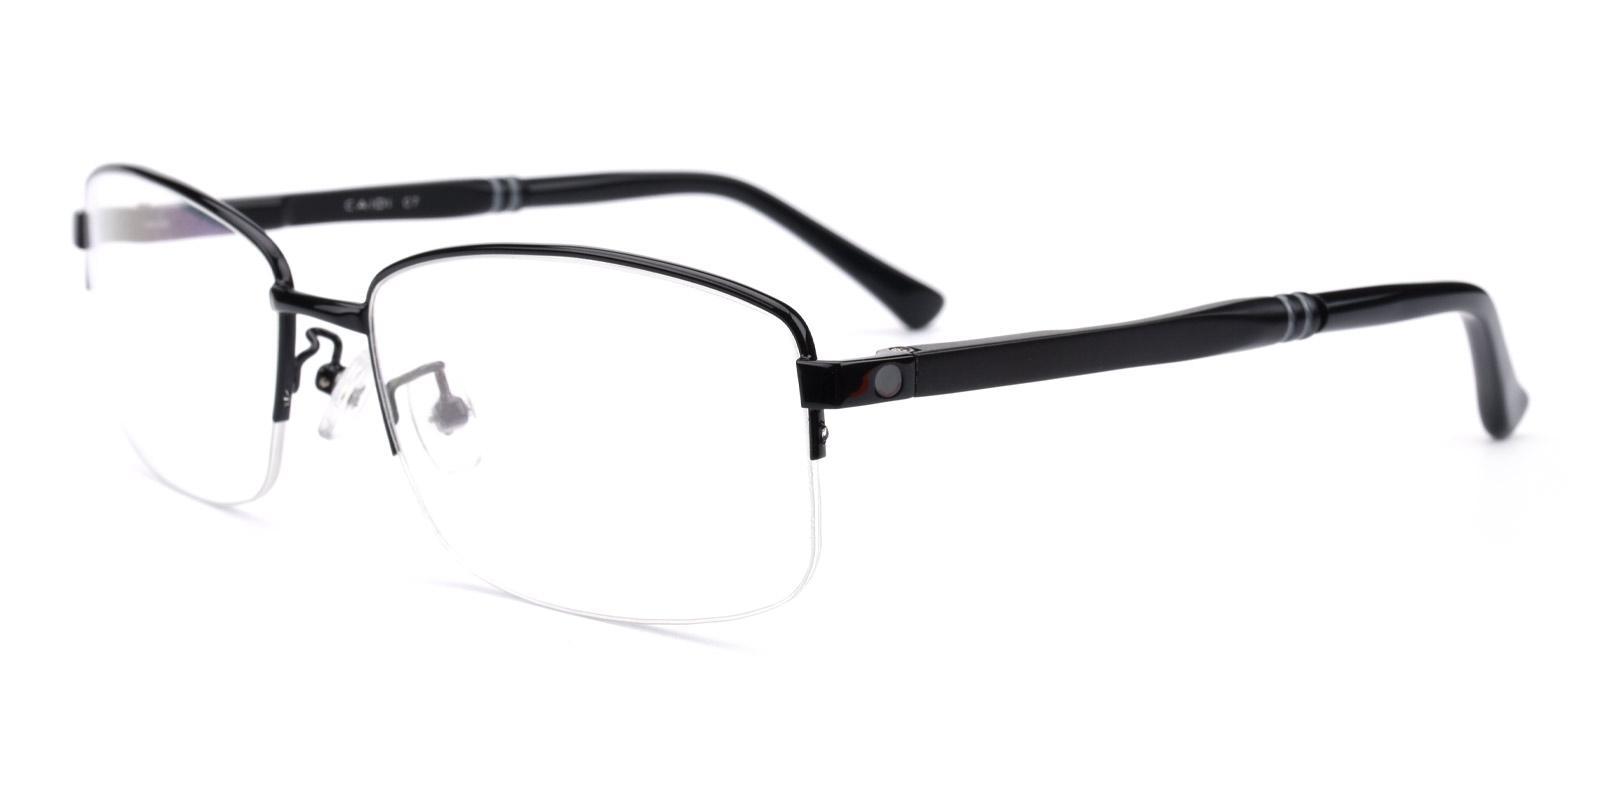 Karma-Black-Metal-Eyeglasses-detail1